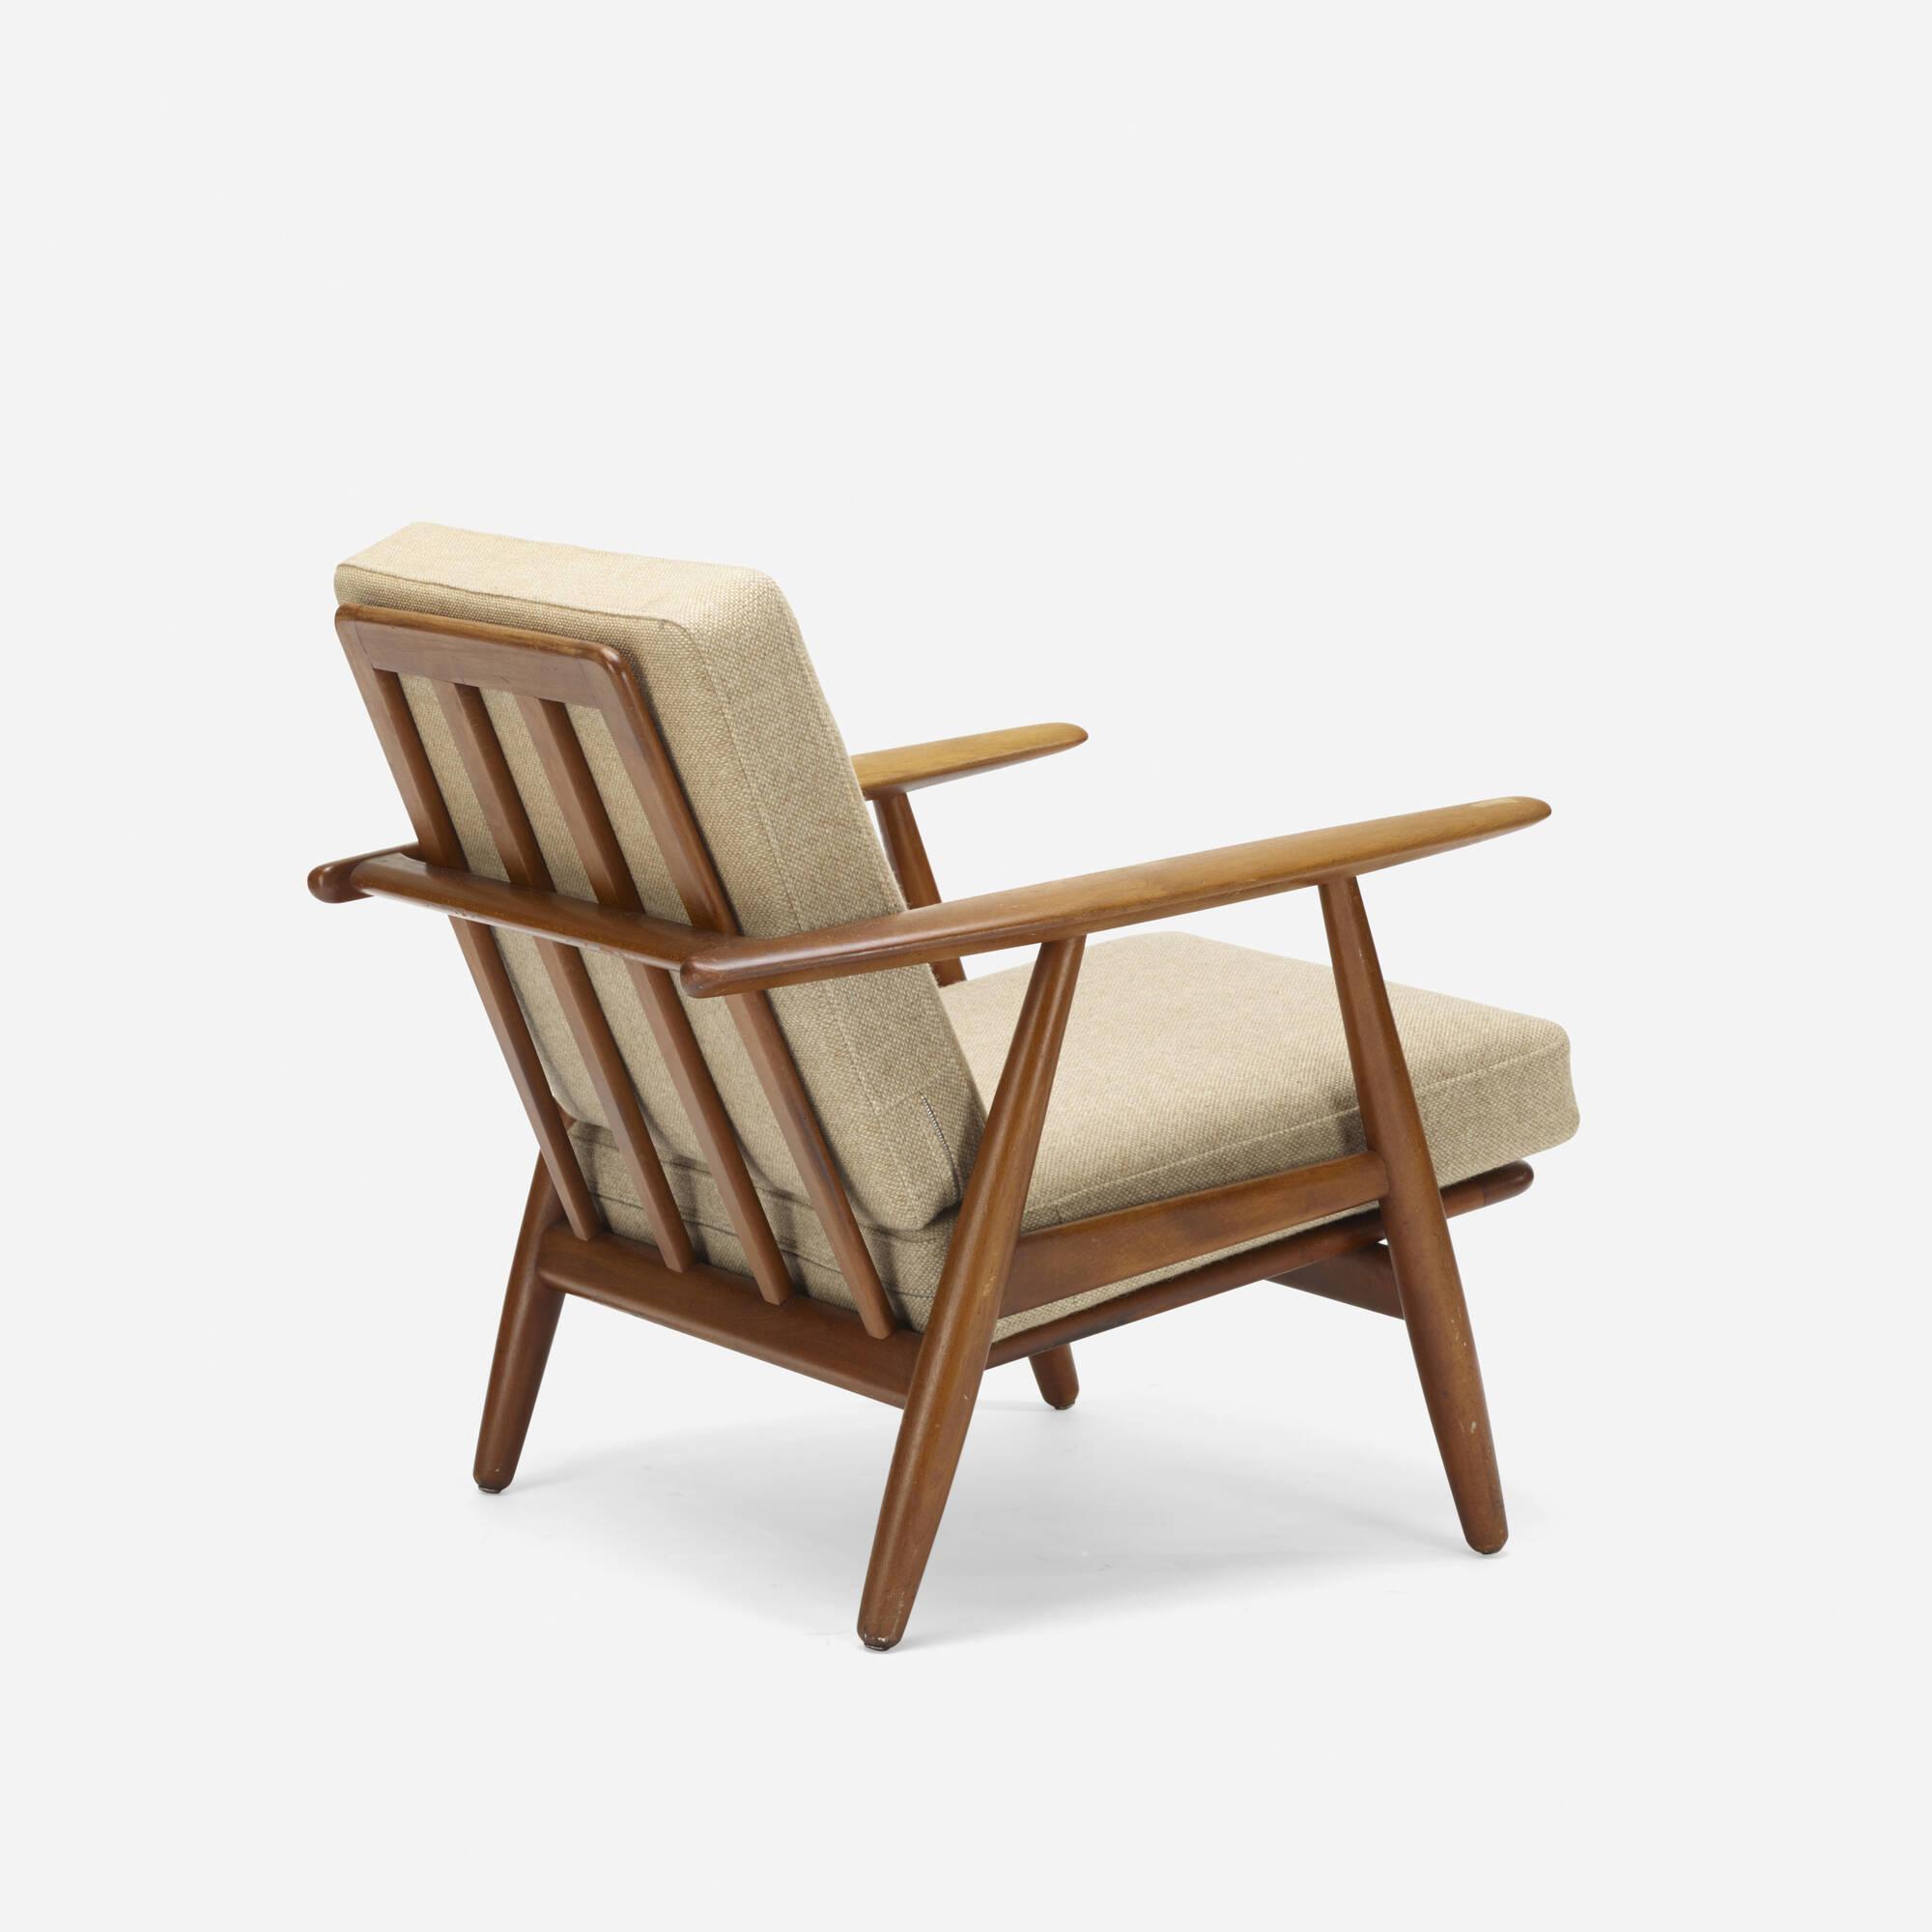 Exceptionnel 151: Hans J. Wegner / Lounge Chair, Model GE240 (1 Of 2